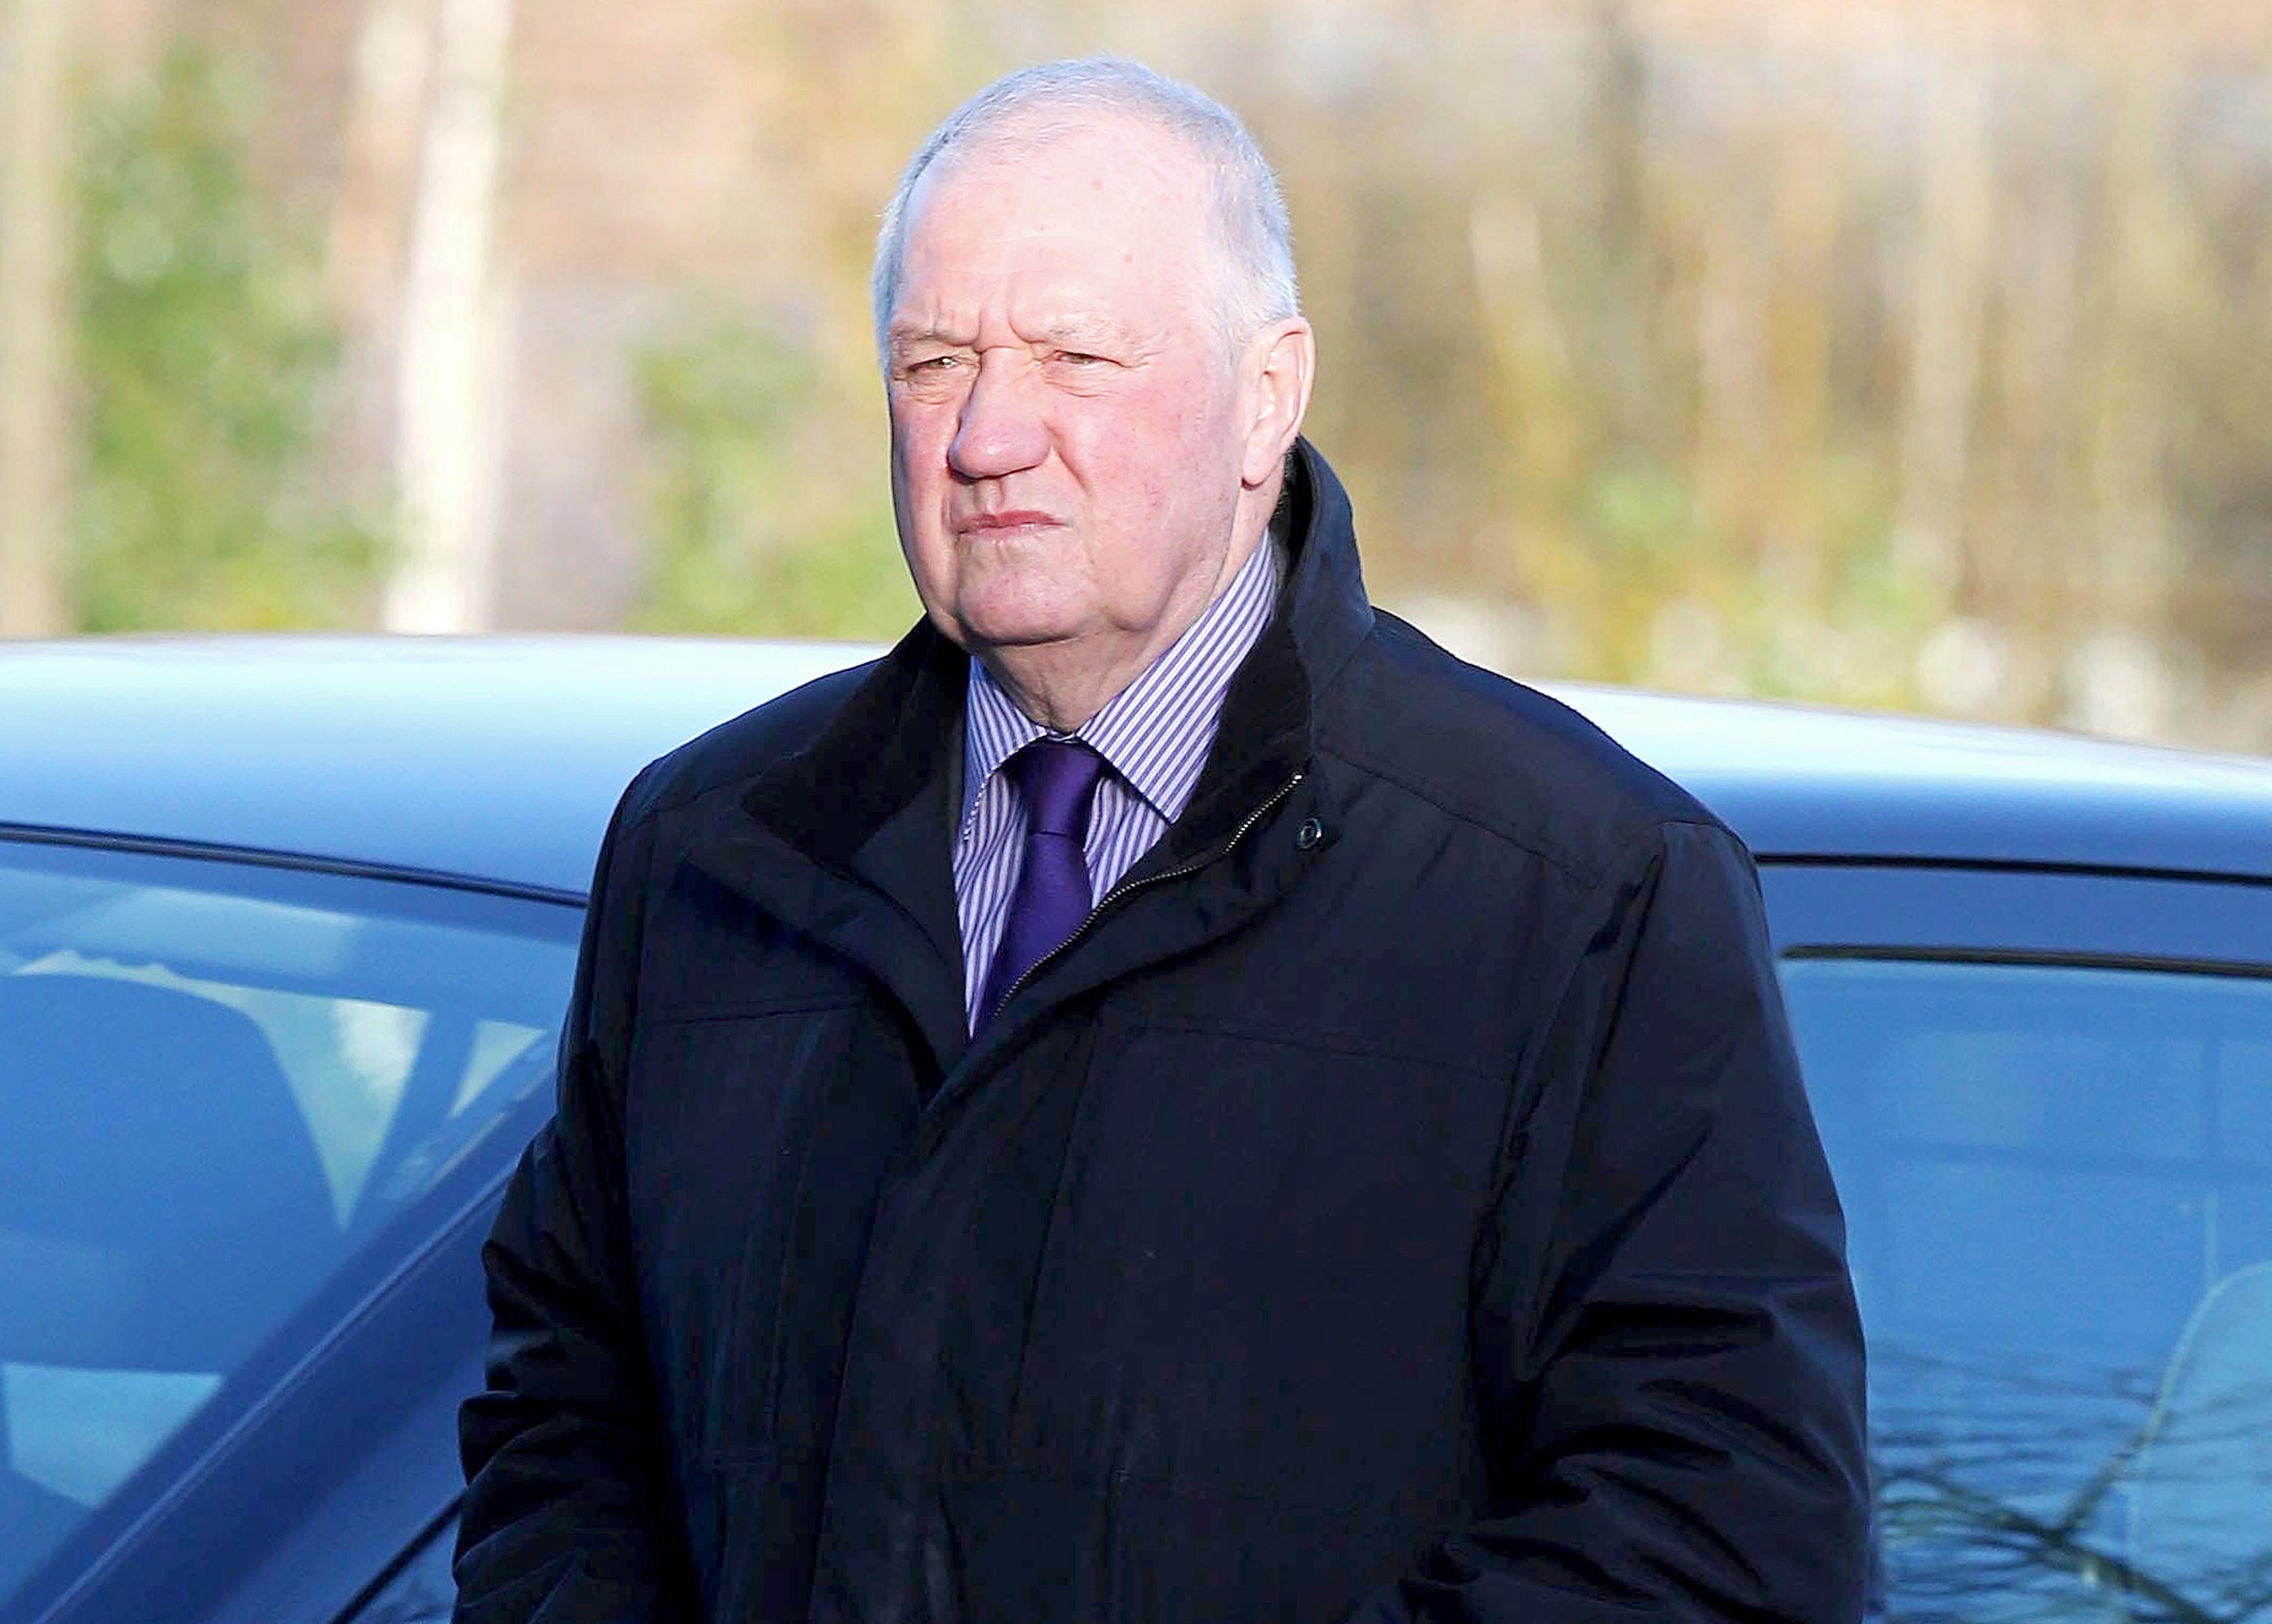 Manslaughter Trial Of Hillsborough Match Commander David Duckenfield